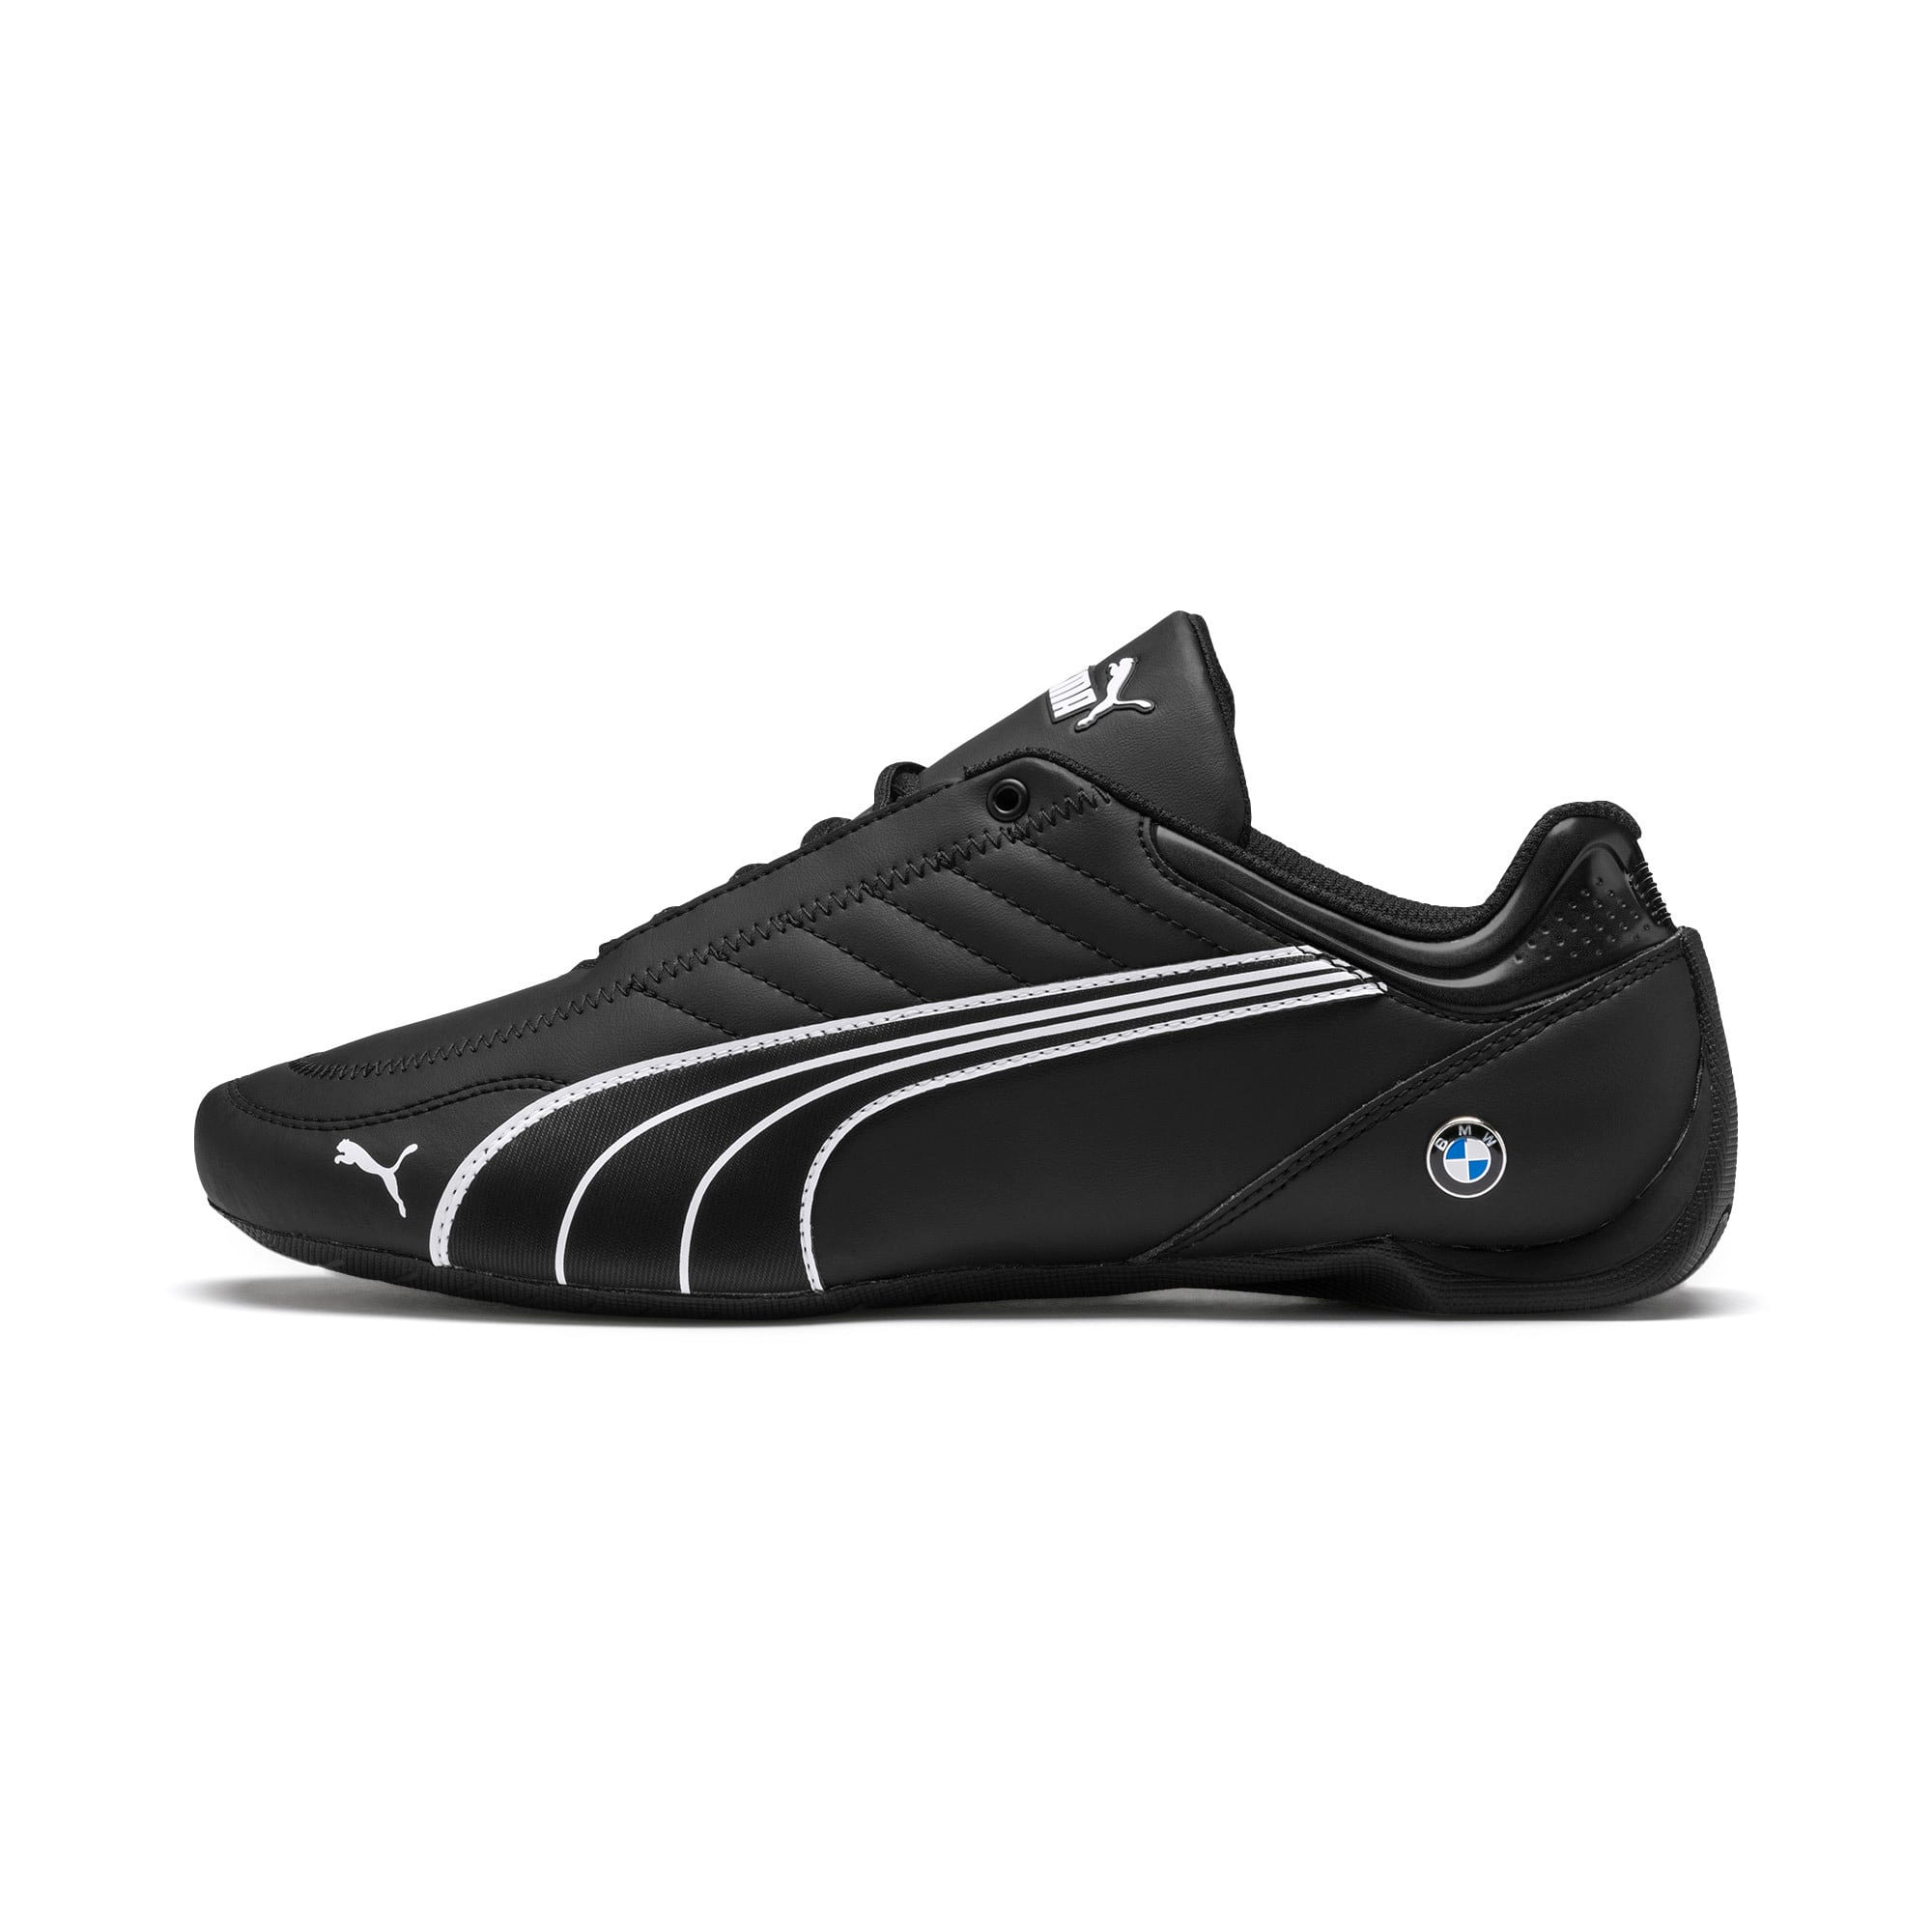 Thumbnail 1 of BMW M Motorsport Future Kart Cat Shoes, Puma Black-Puma White, medium